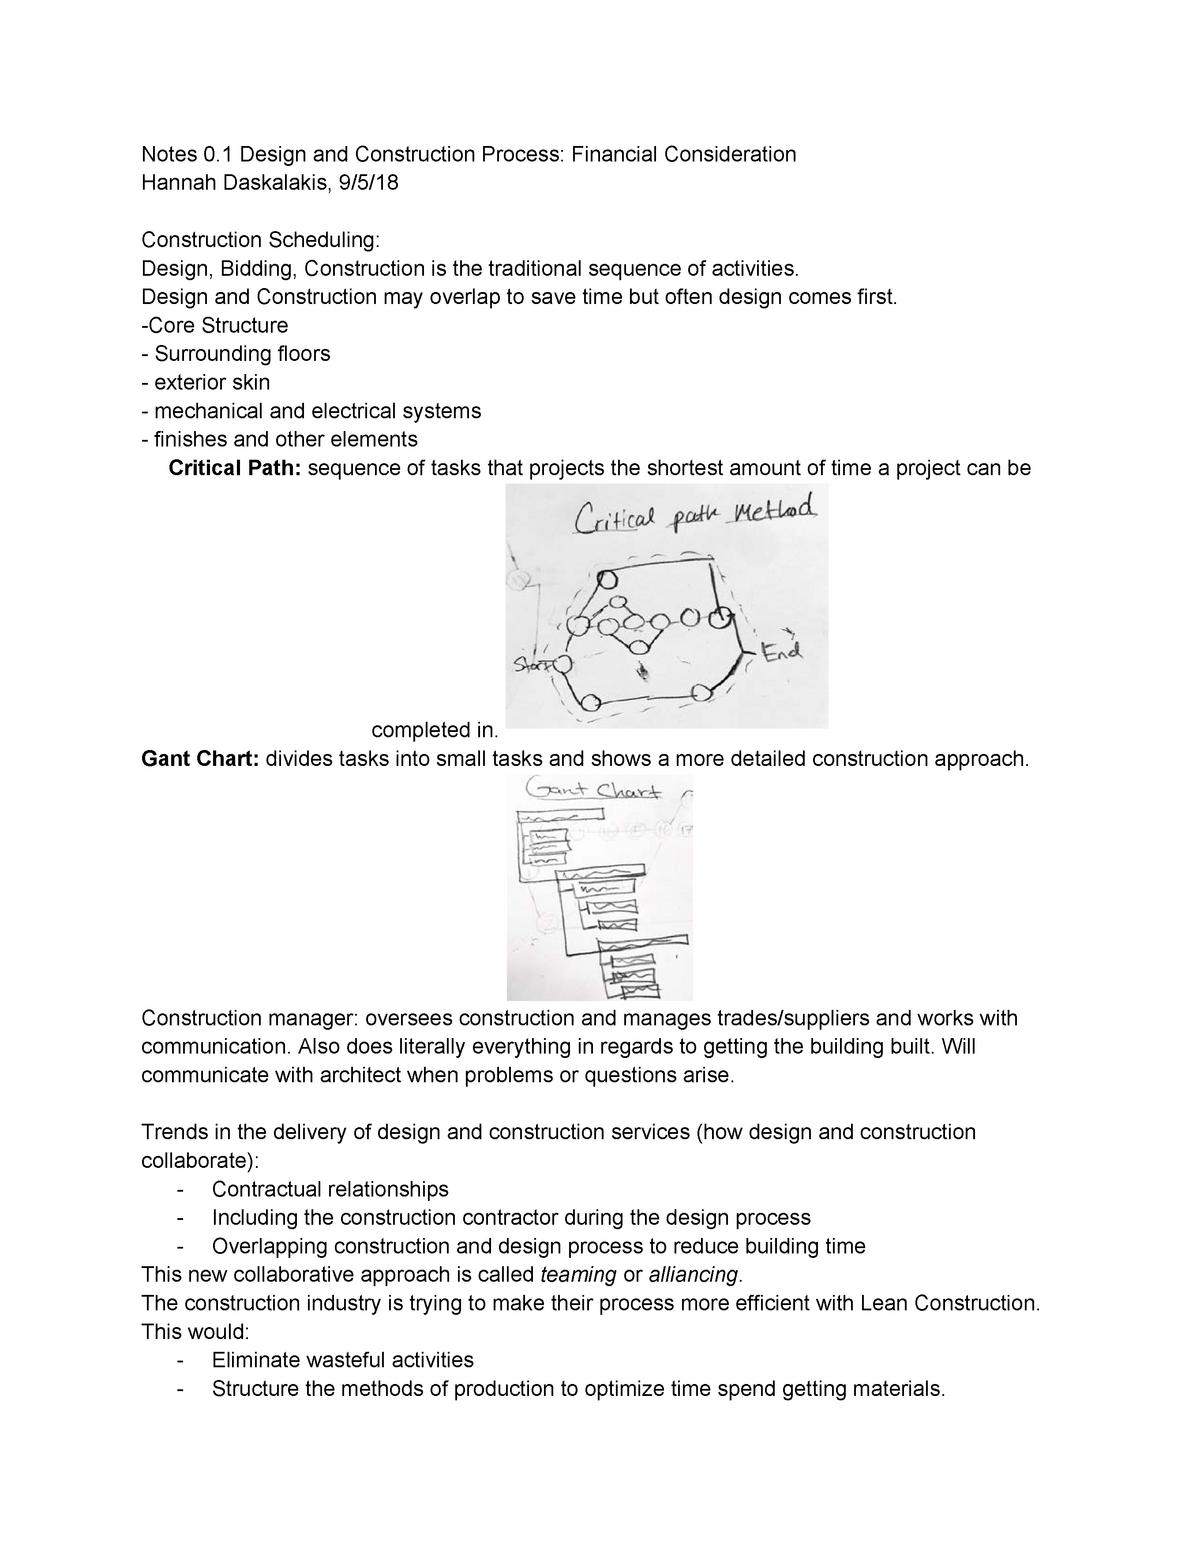 Notes 1 Building Tech 4 - ARCH 2430 - StuDocu